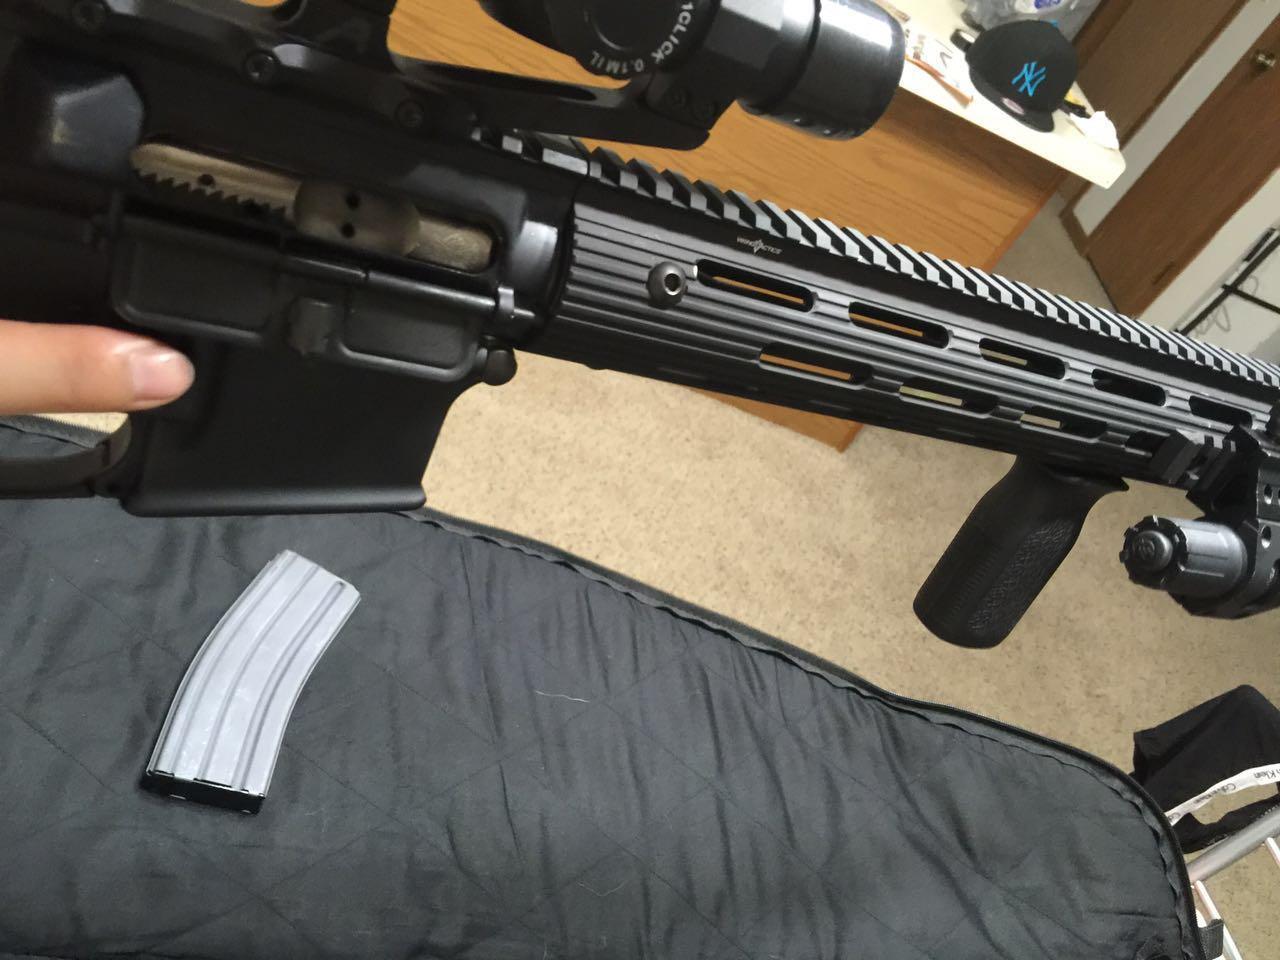 3 8 Bolt >> M4A1步枪的正确换弹夹和上膛方式? - 知乎